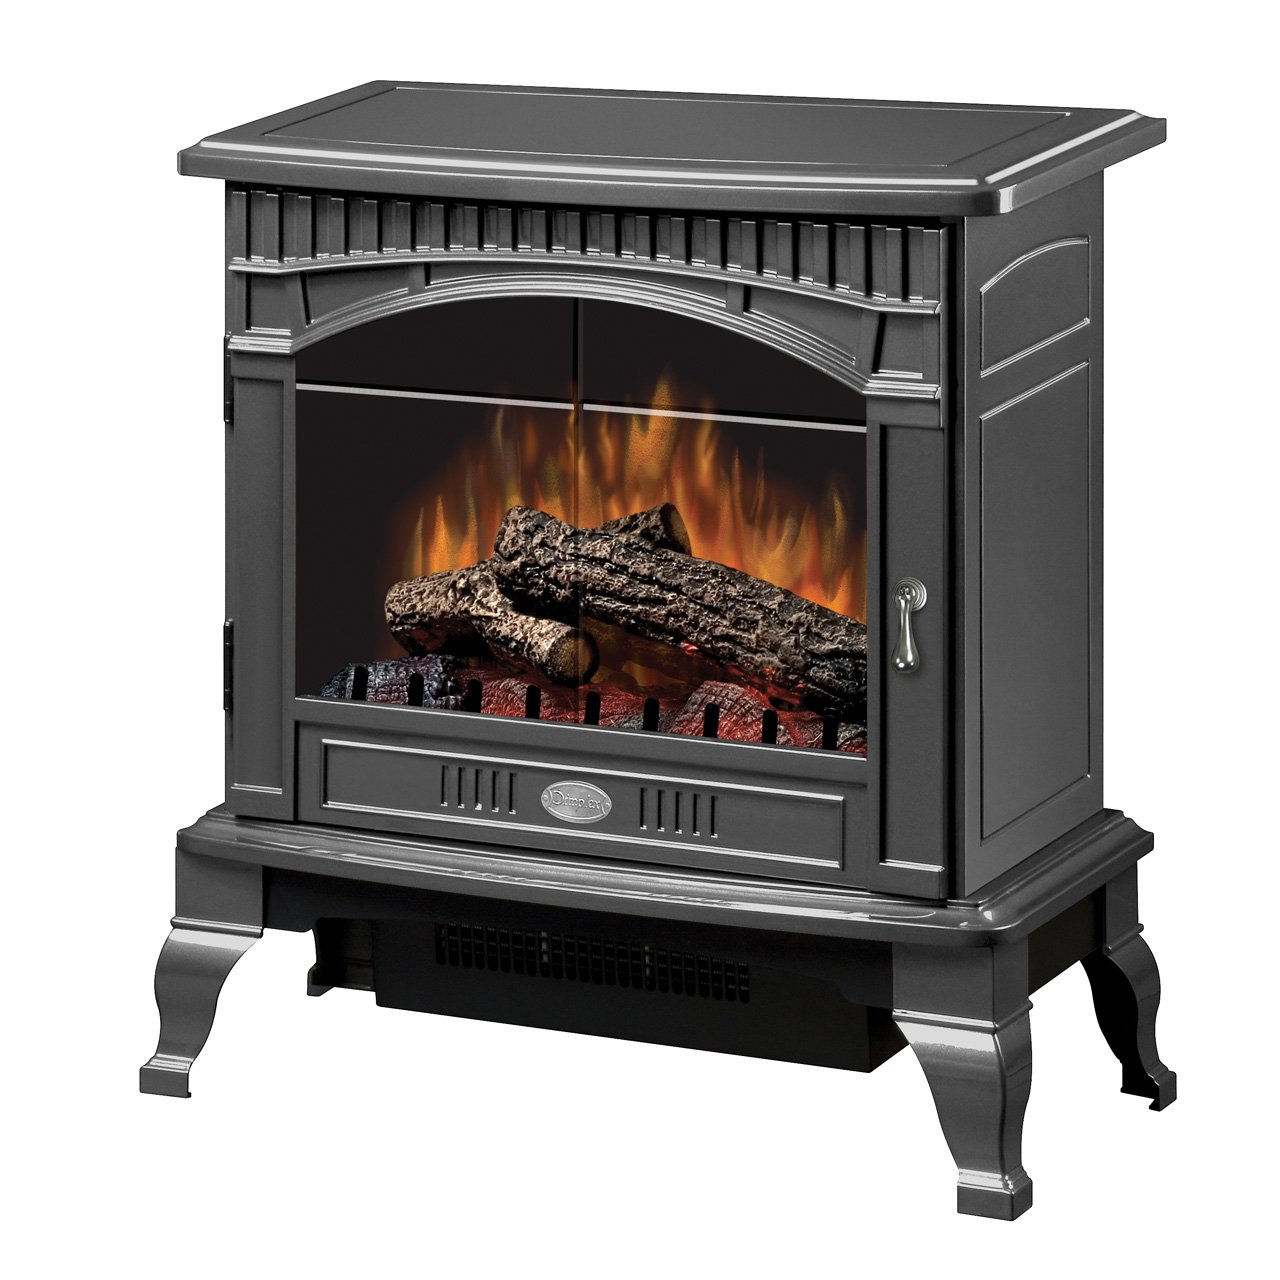 DIMPLEX NORTH AMERICA, DS5629CR Traditonal Electric Fireplace by DIMPLEX NORTH AMERICA,